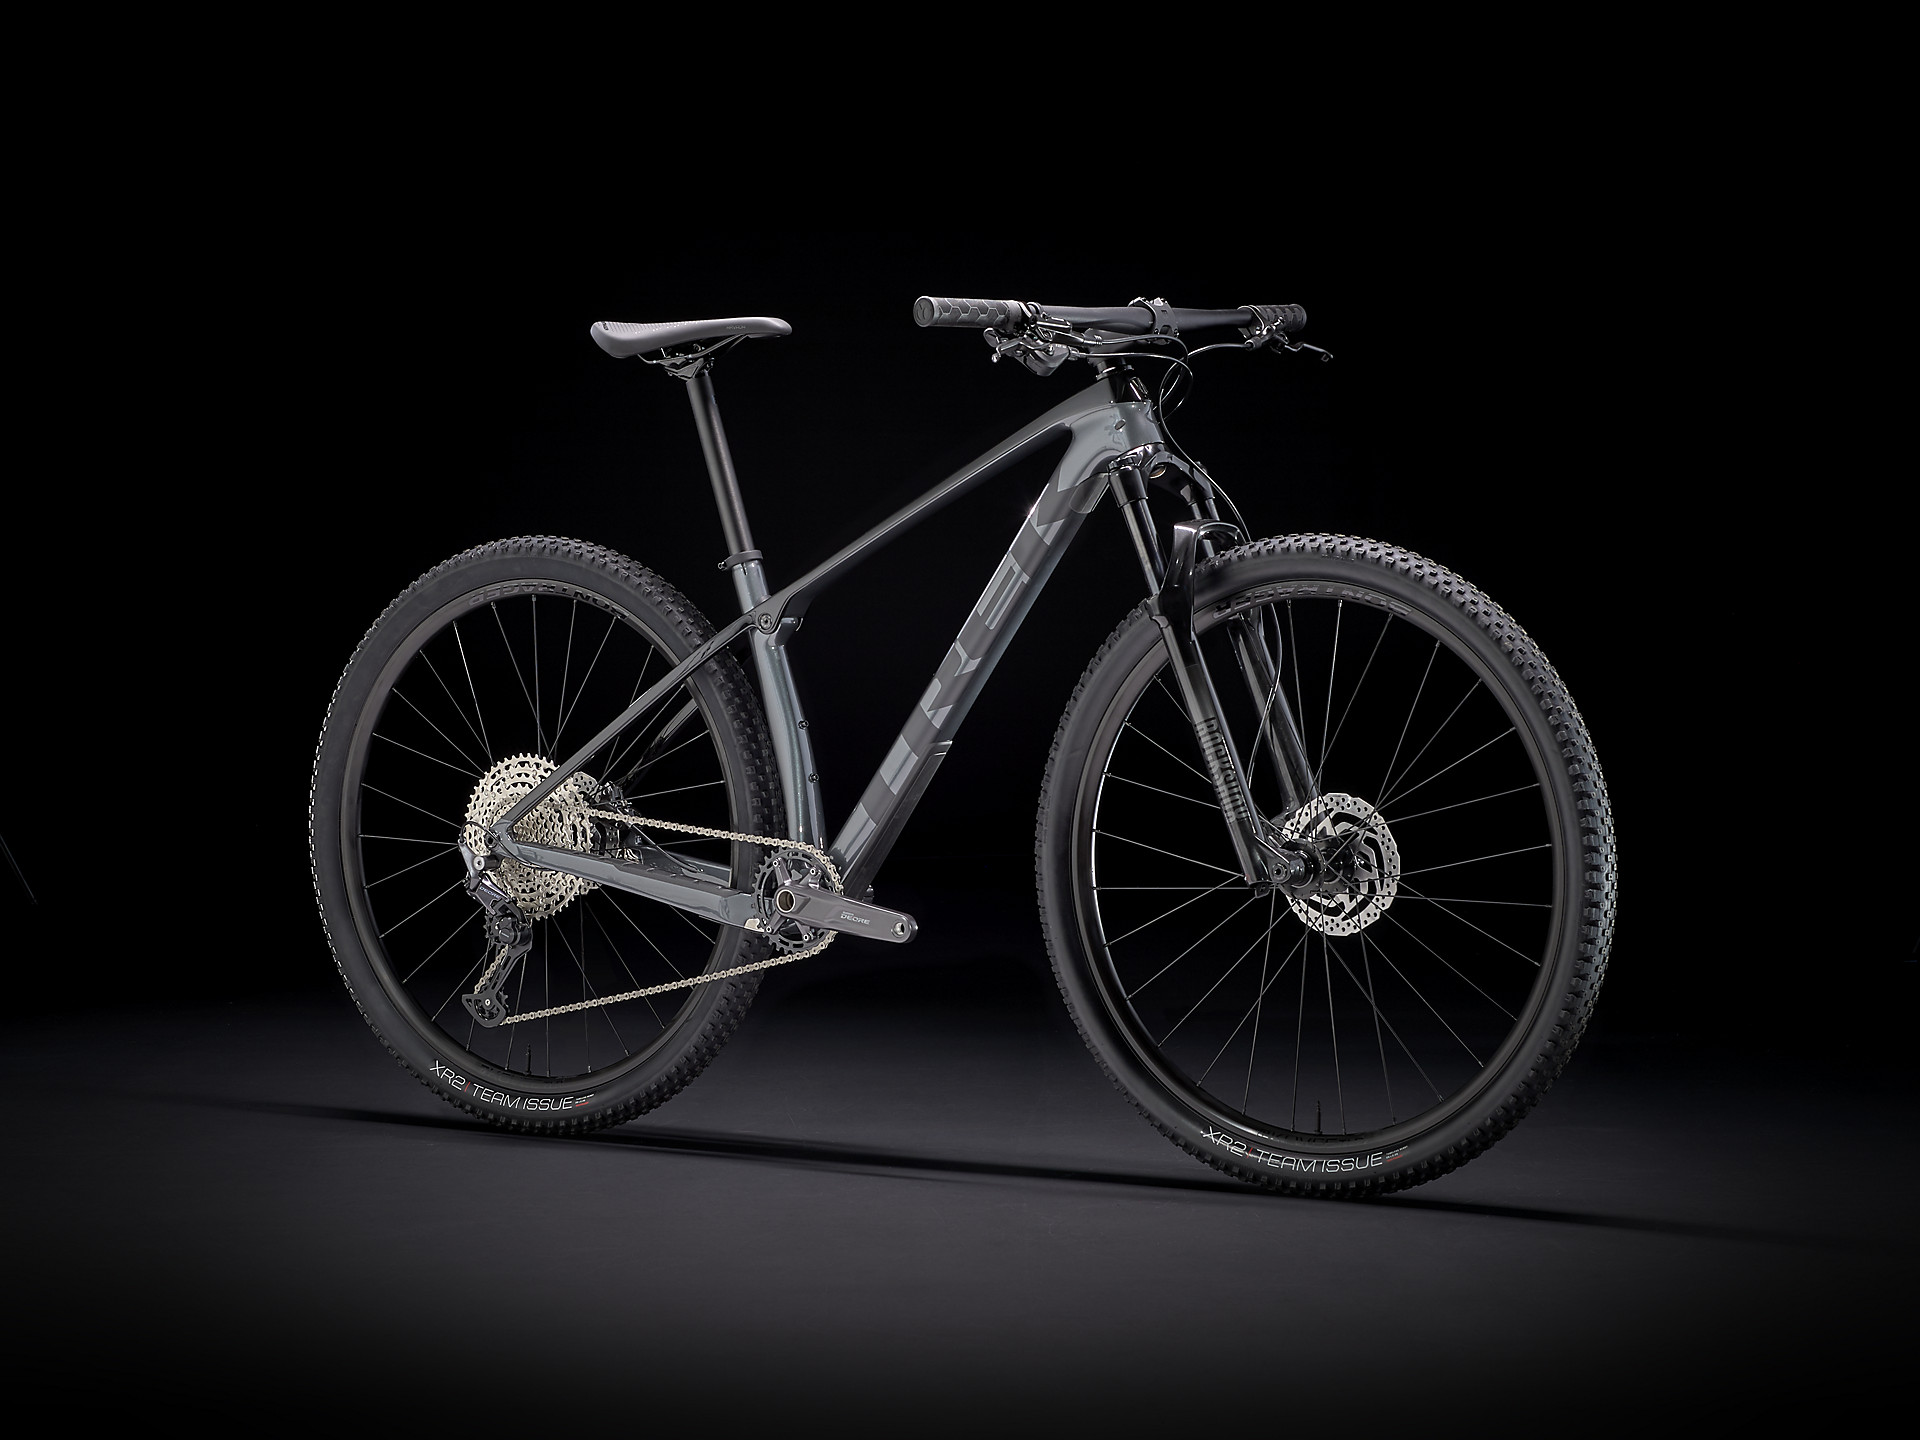 Trek Procaliber 9.5 Cross Country Mountain Bike